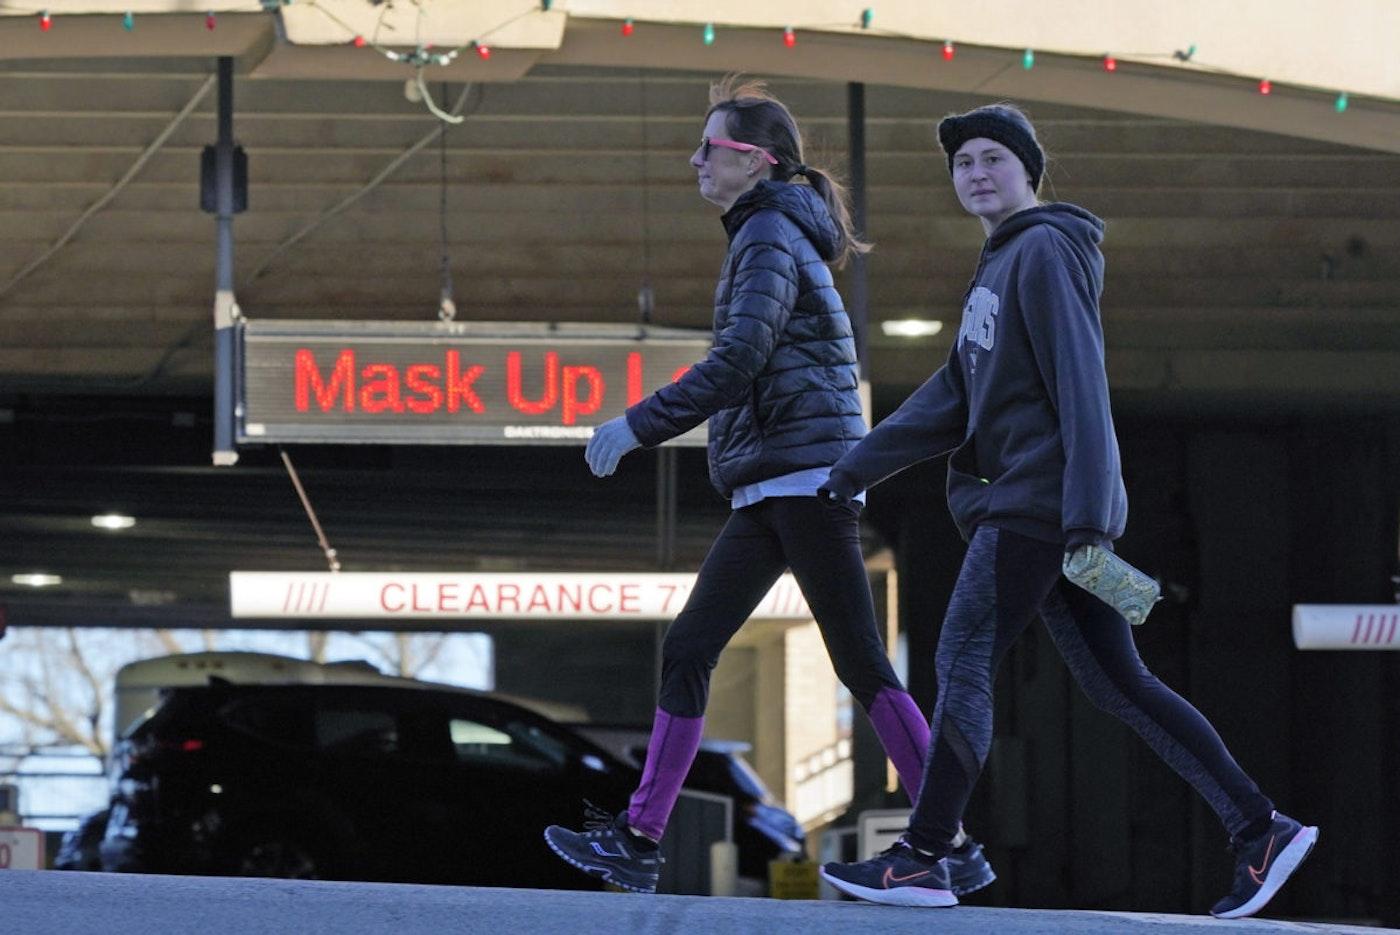 Two women walk past a sign on a parking garage in Mount Lebanon, Pa., reminding people to wear masks, Nov. 18, 2020. (AP Photo/Gene J. Puskar)